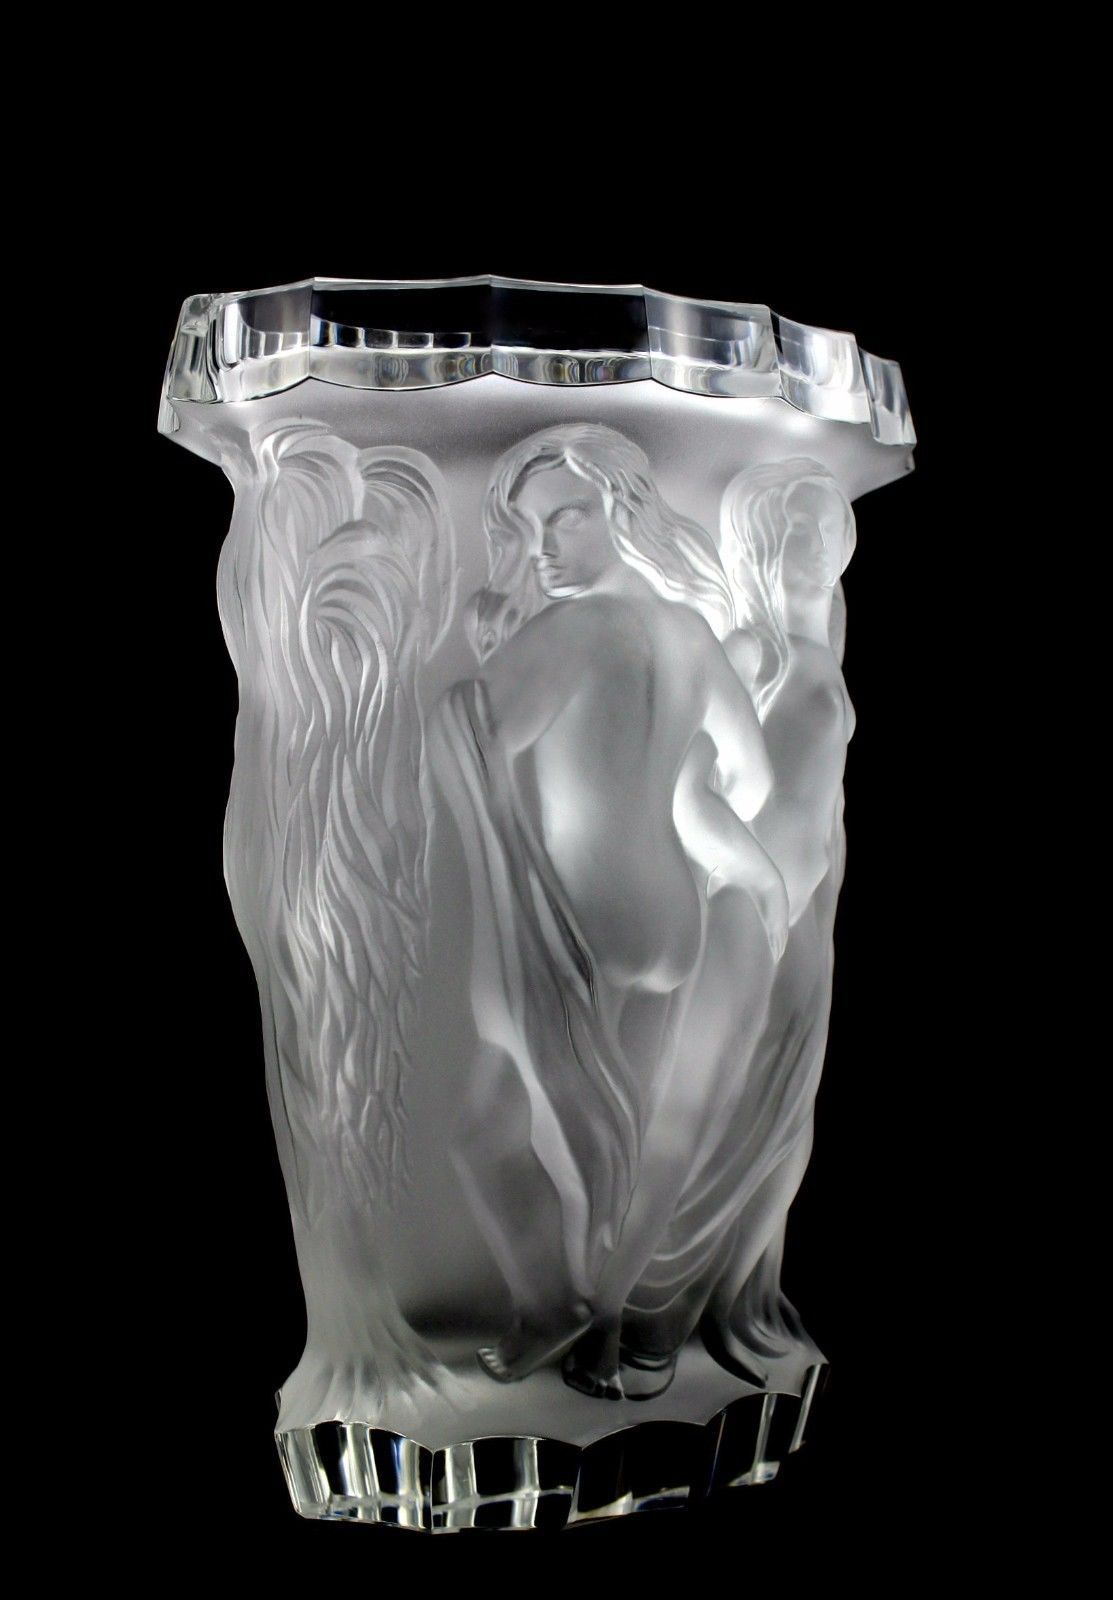 Glamorous france art deco bohemian bacchantes top quality glass glamorous france art deco bohemian bacchantes top quality glass vase ebay floridaeventfo Images